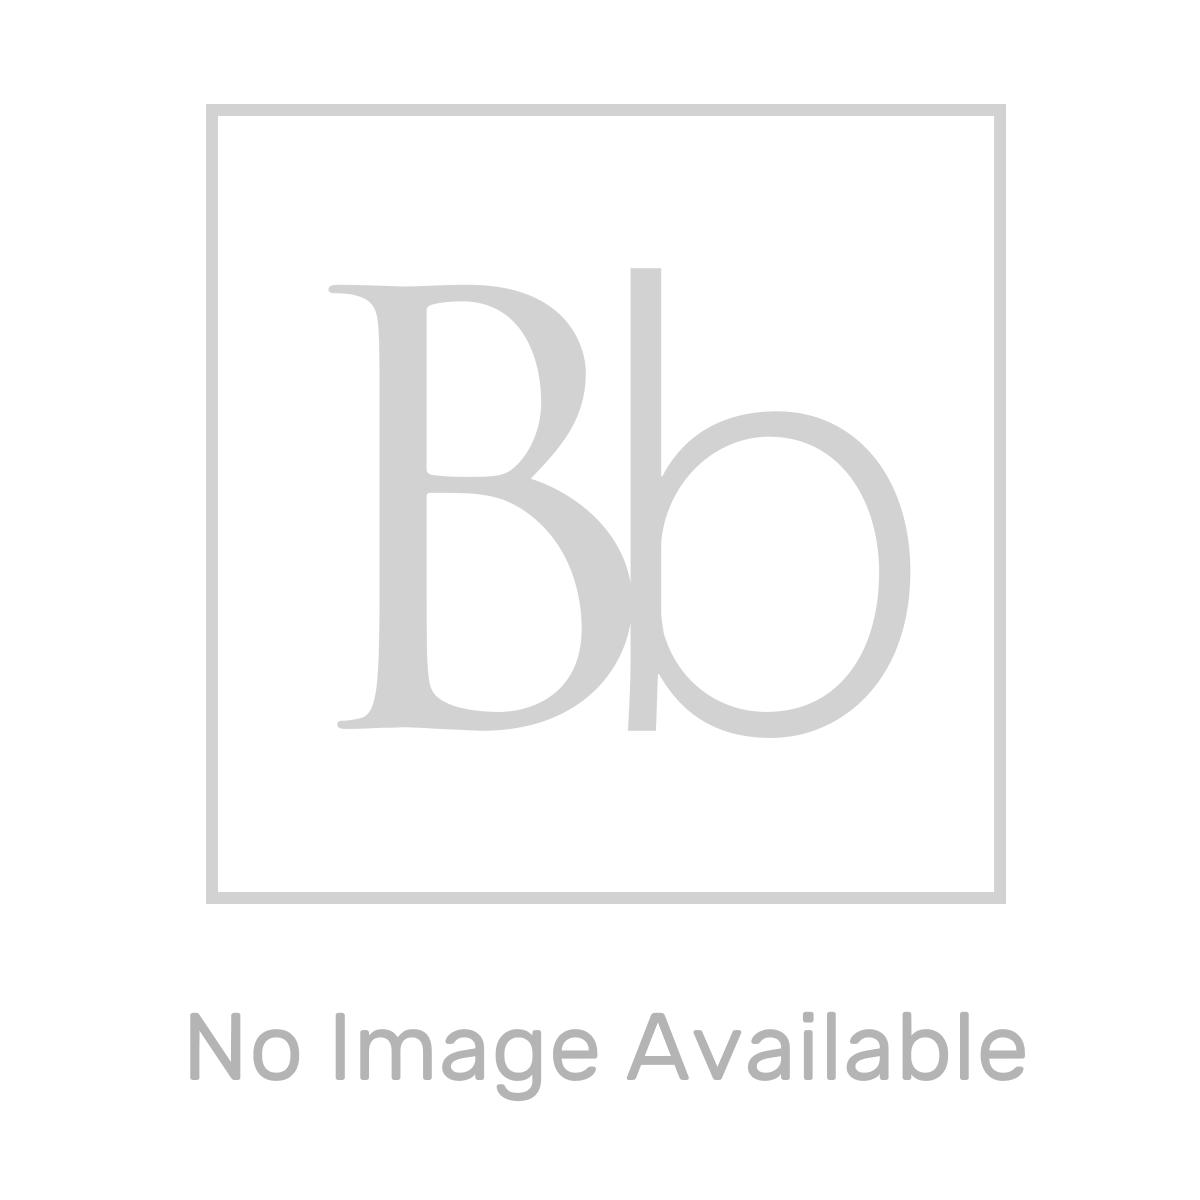 Kartell K-vit Chrome Push Button Basin Waste CP Slotted